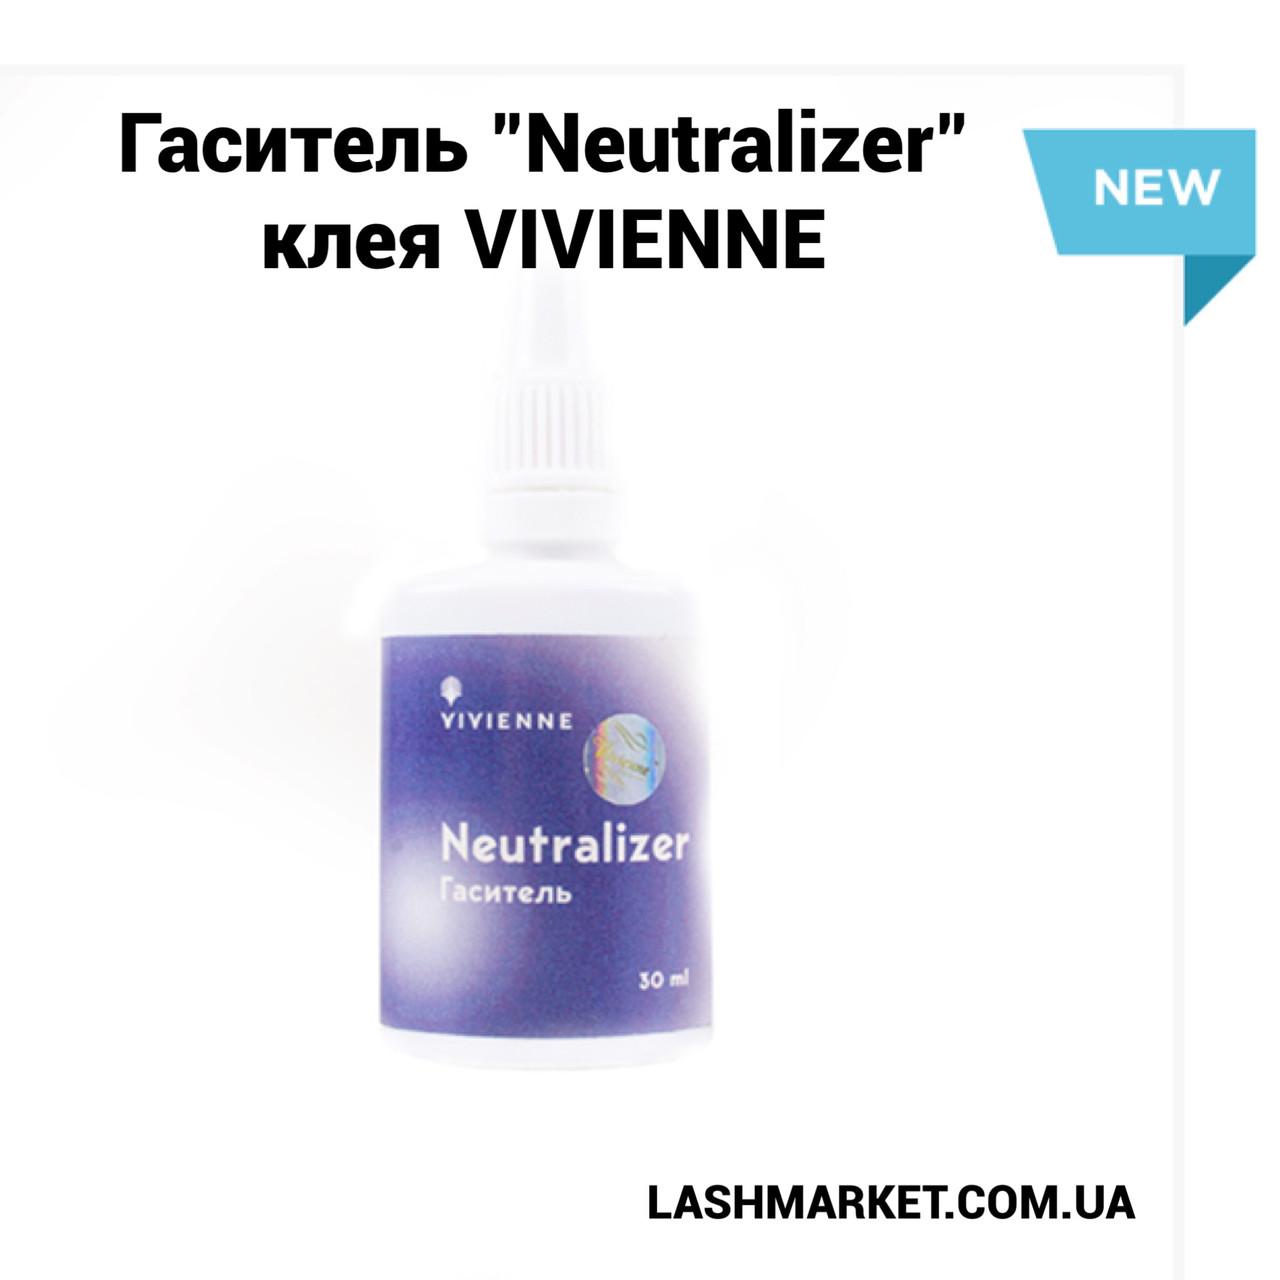 "Гаситель ""Neutralizer"" клея от VIVIENNE, 30 мл"